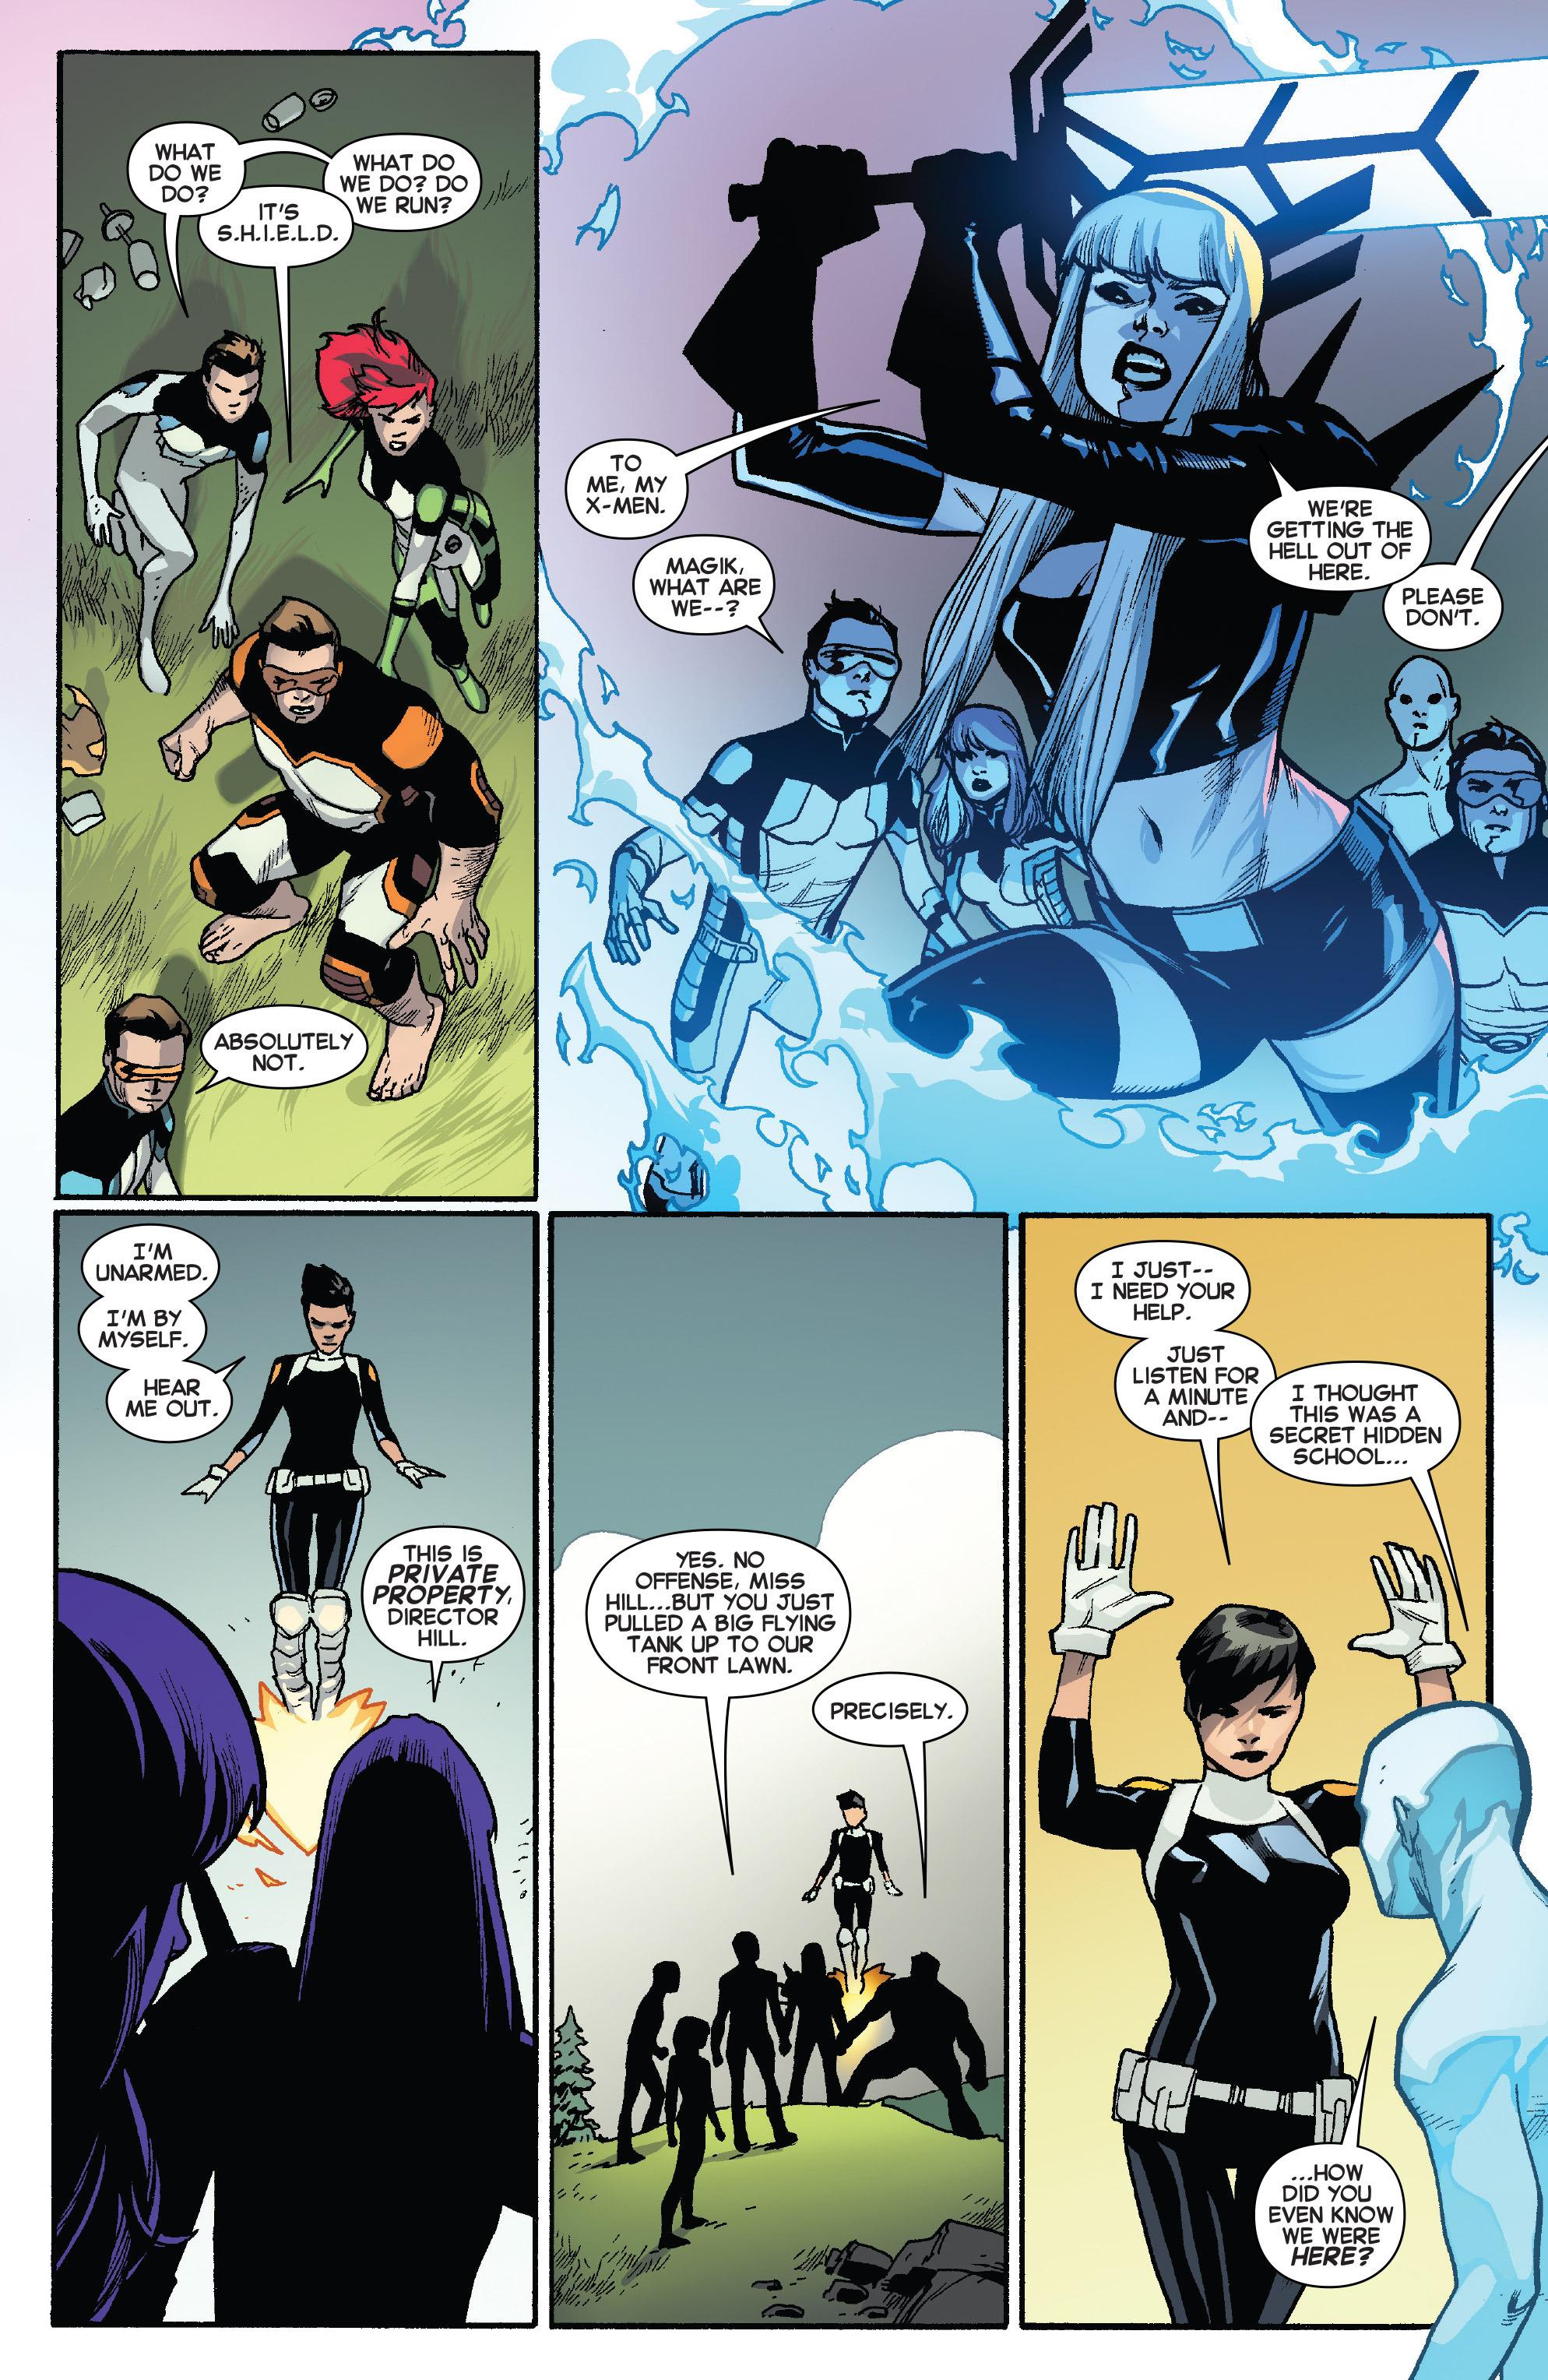 All-New X-Men (2013) chap 41 pic 4